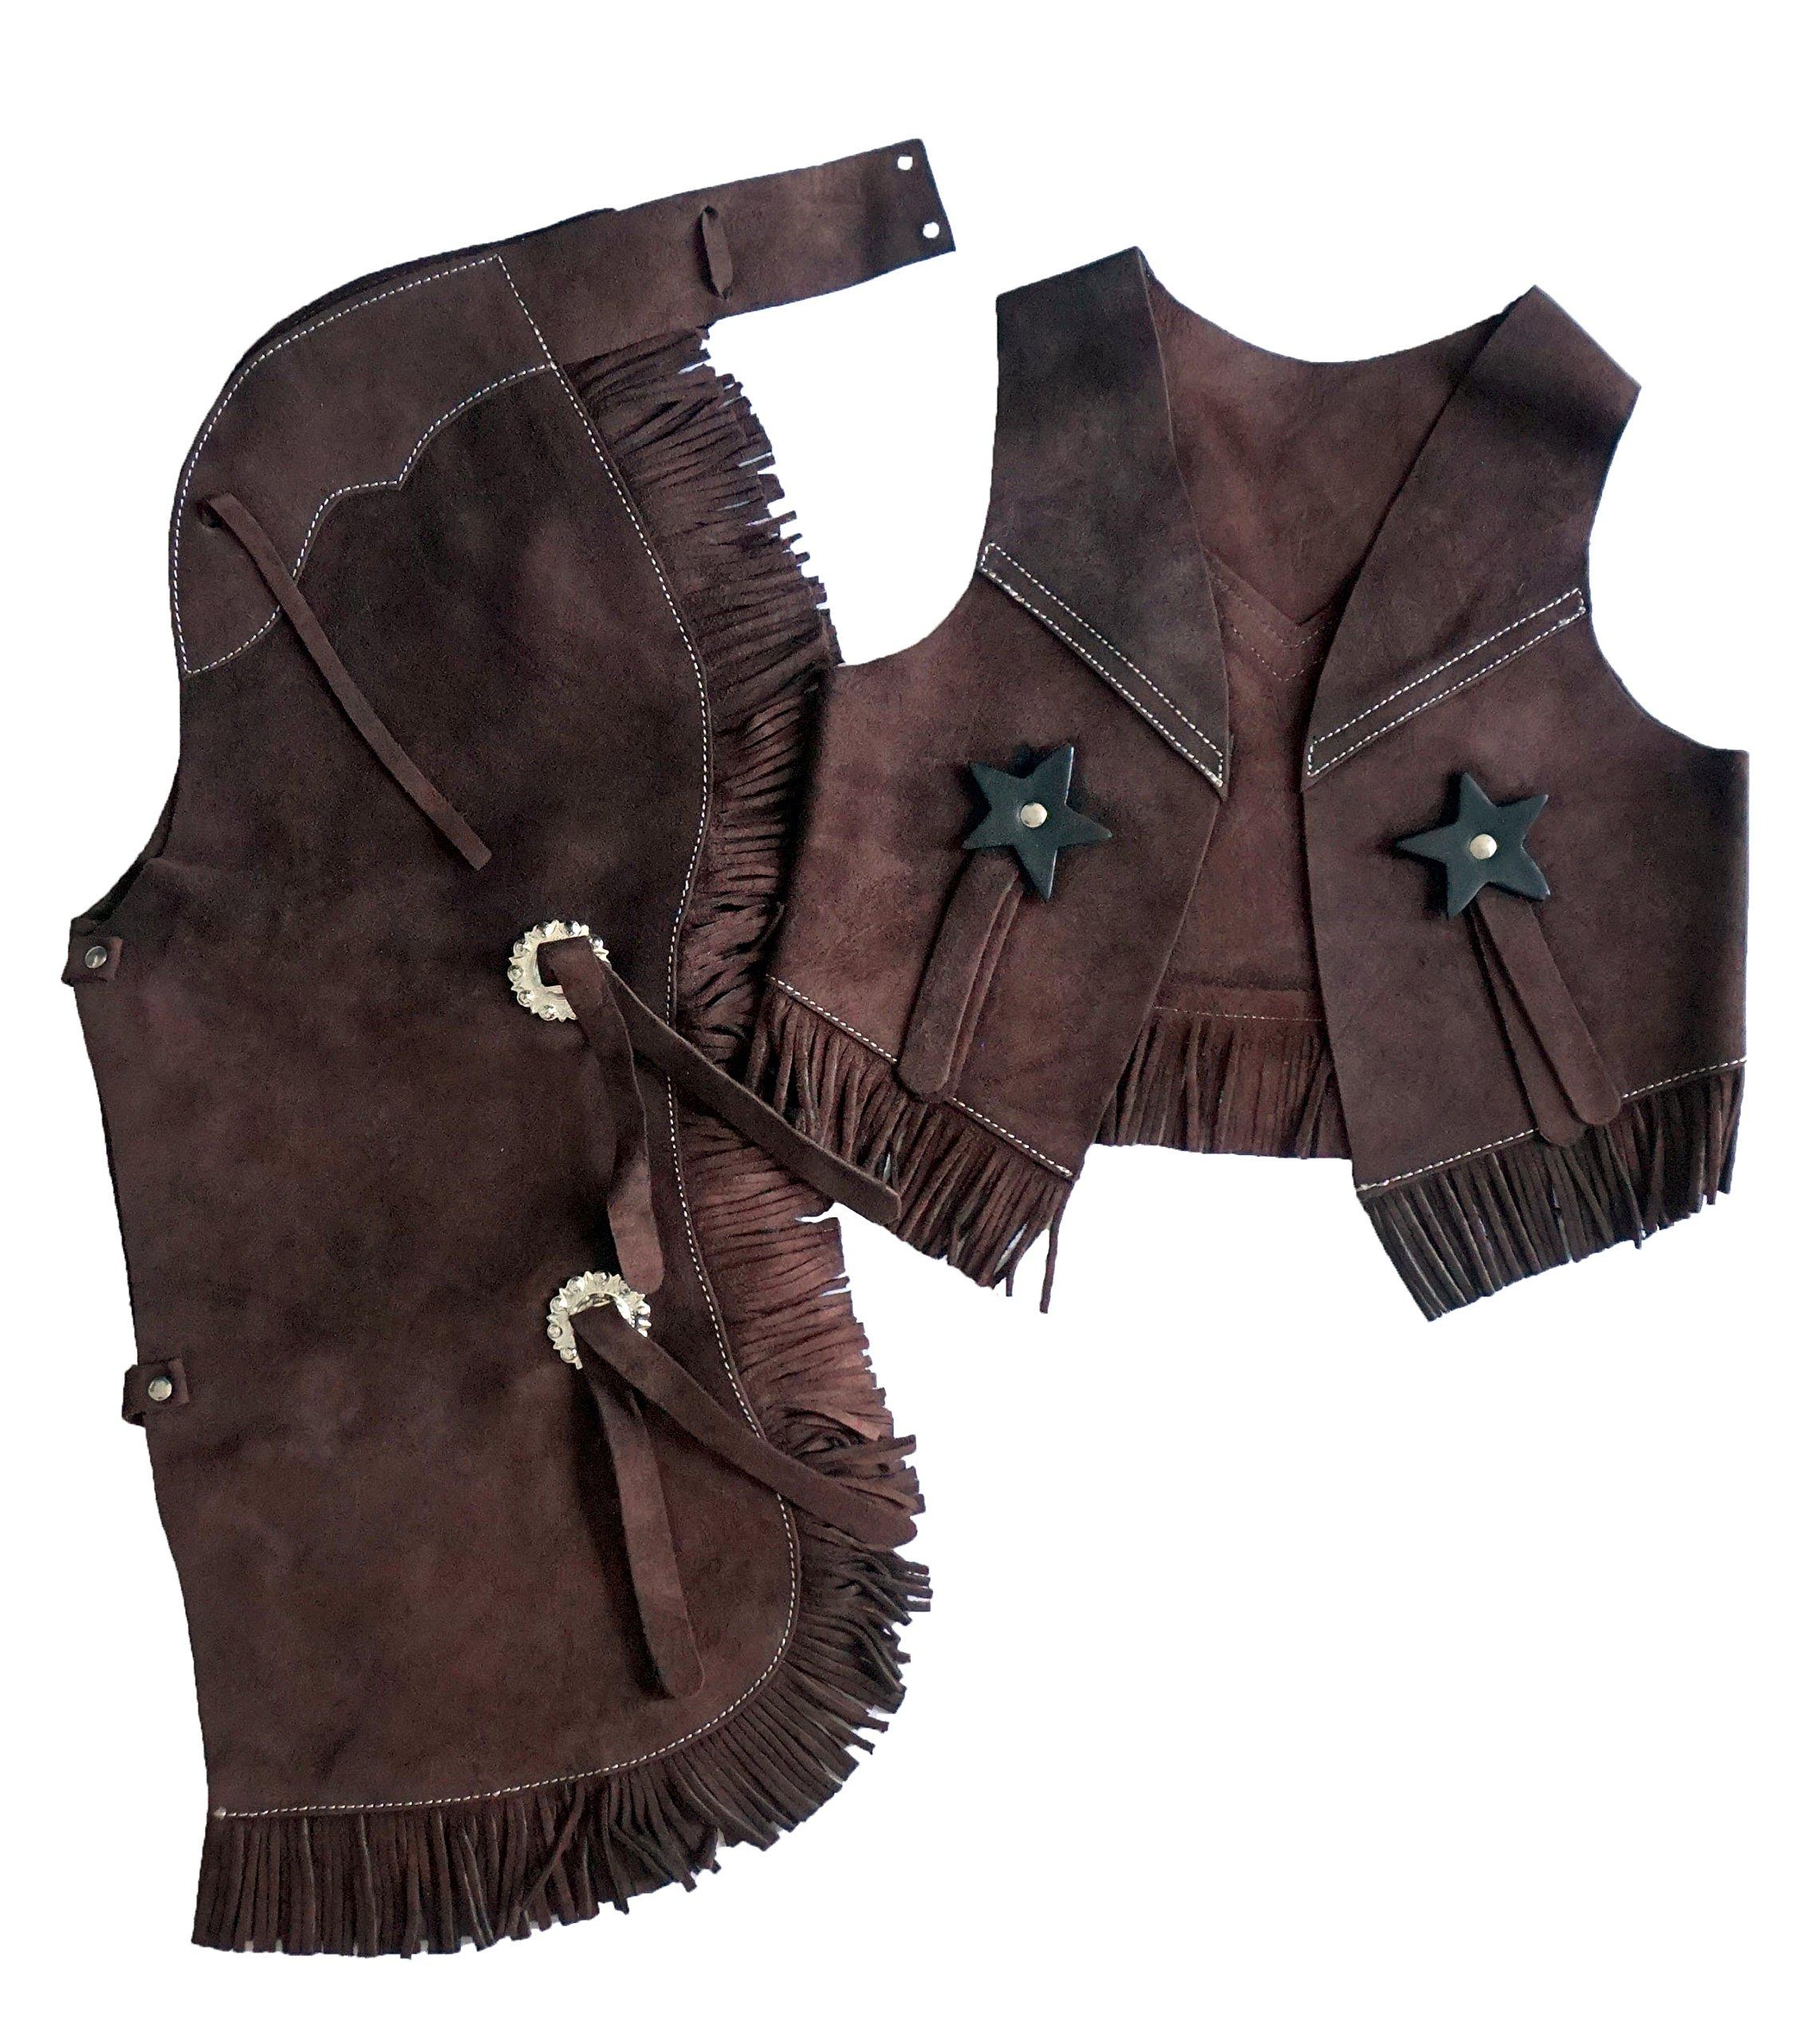 Equitem Children's Suede Leather Western Chaps and Vest Set (Brown, Medium (4-6))